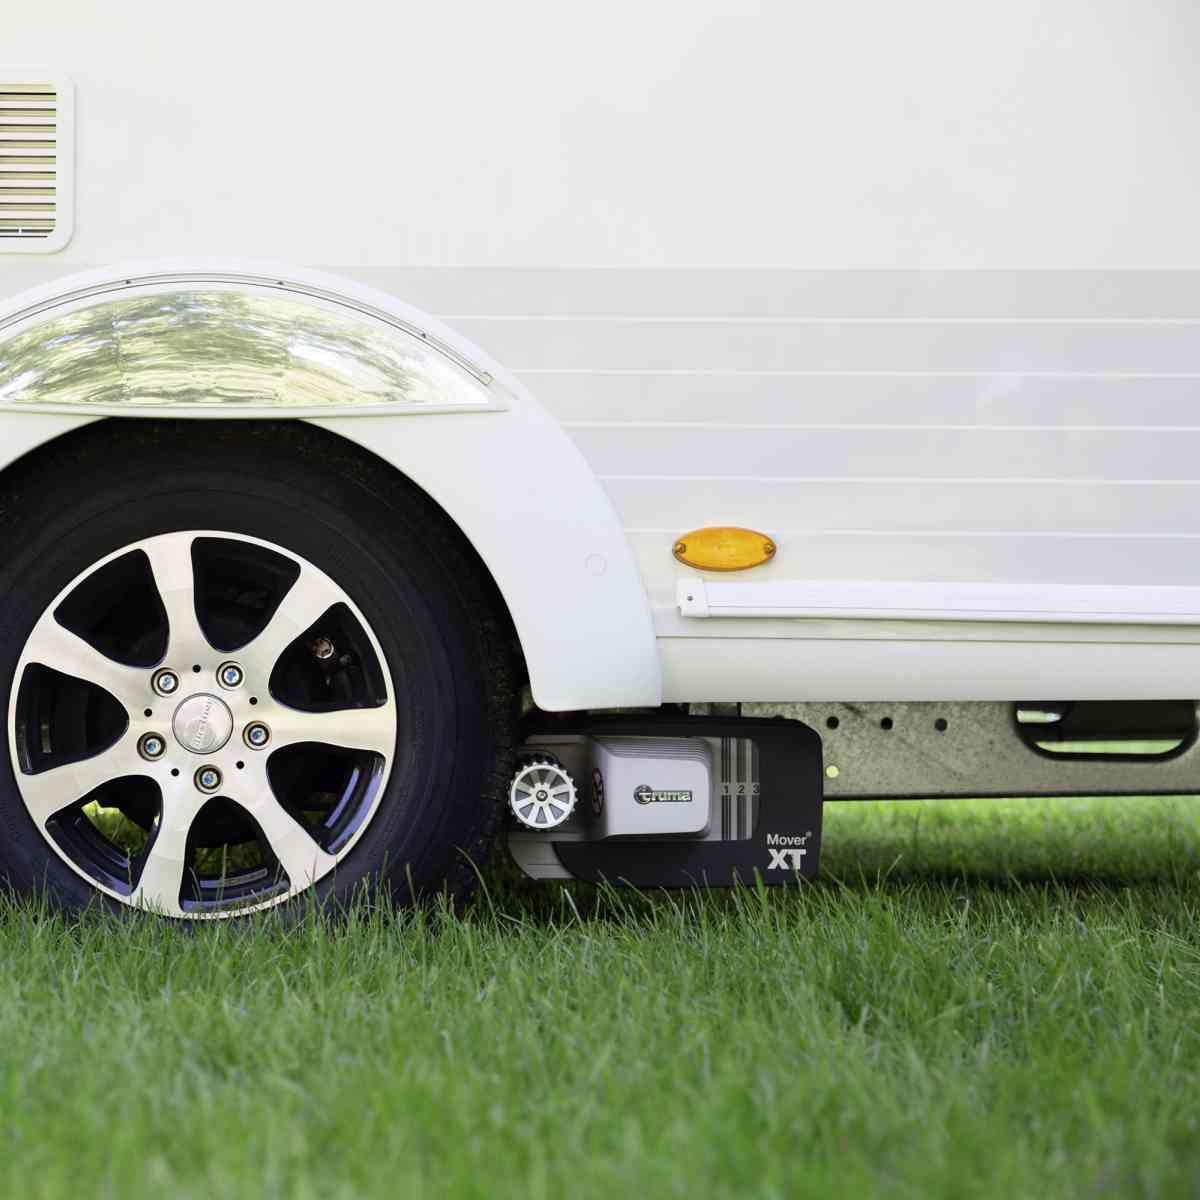 Truma Mover XT with cravan tyre